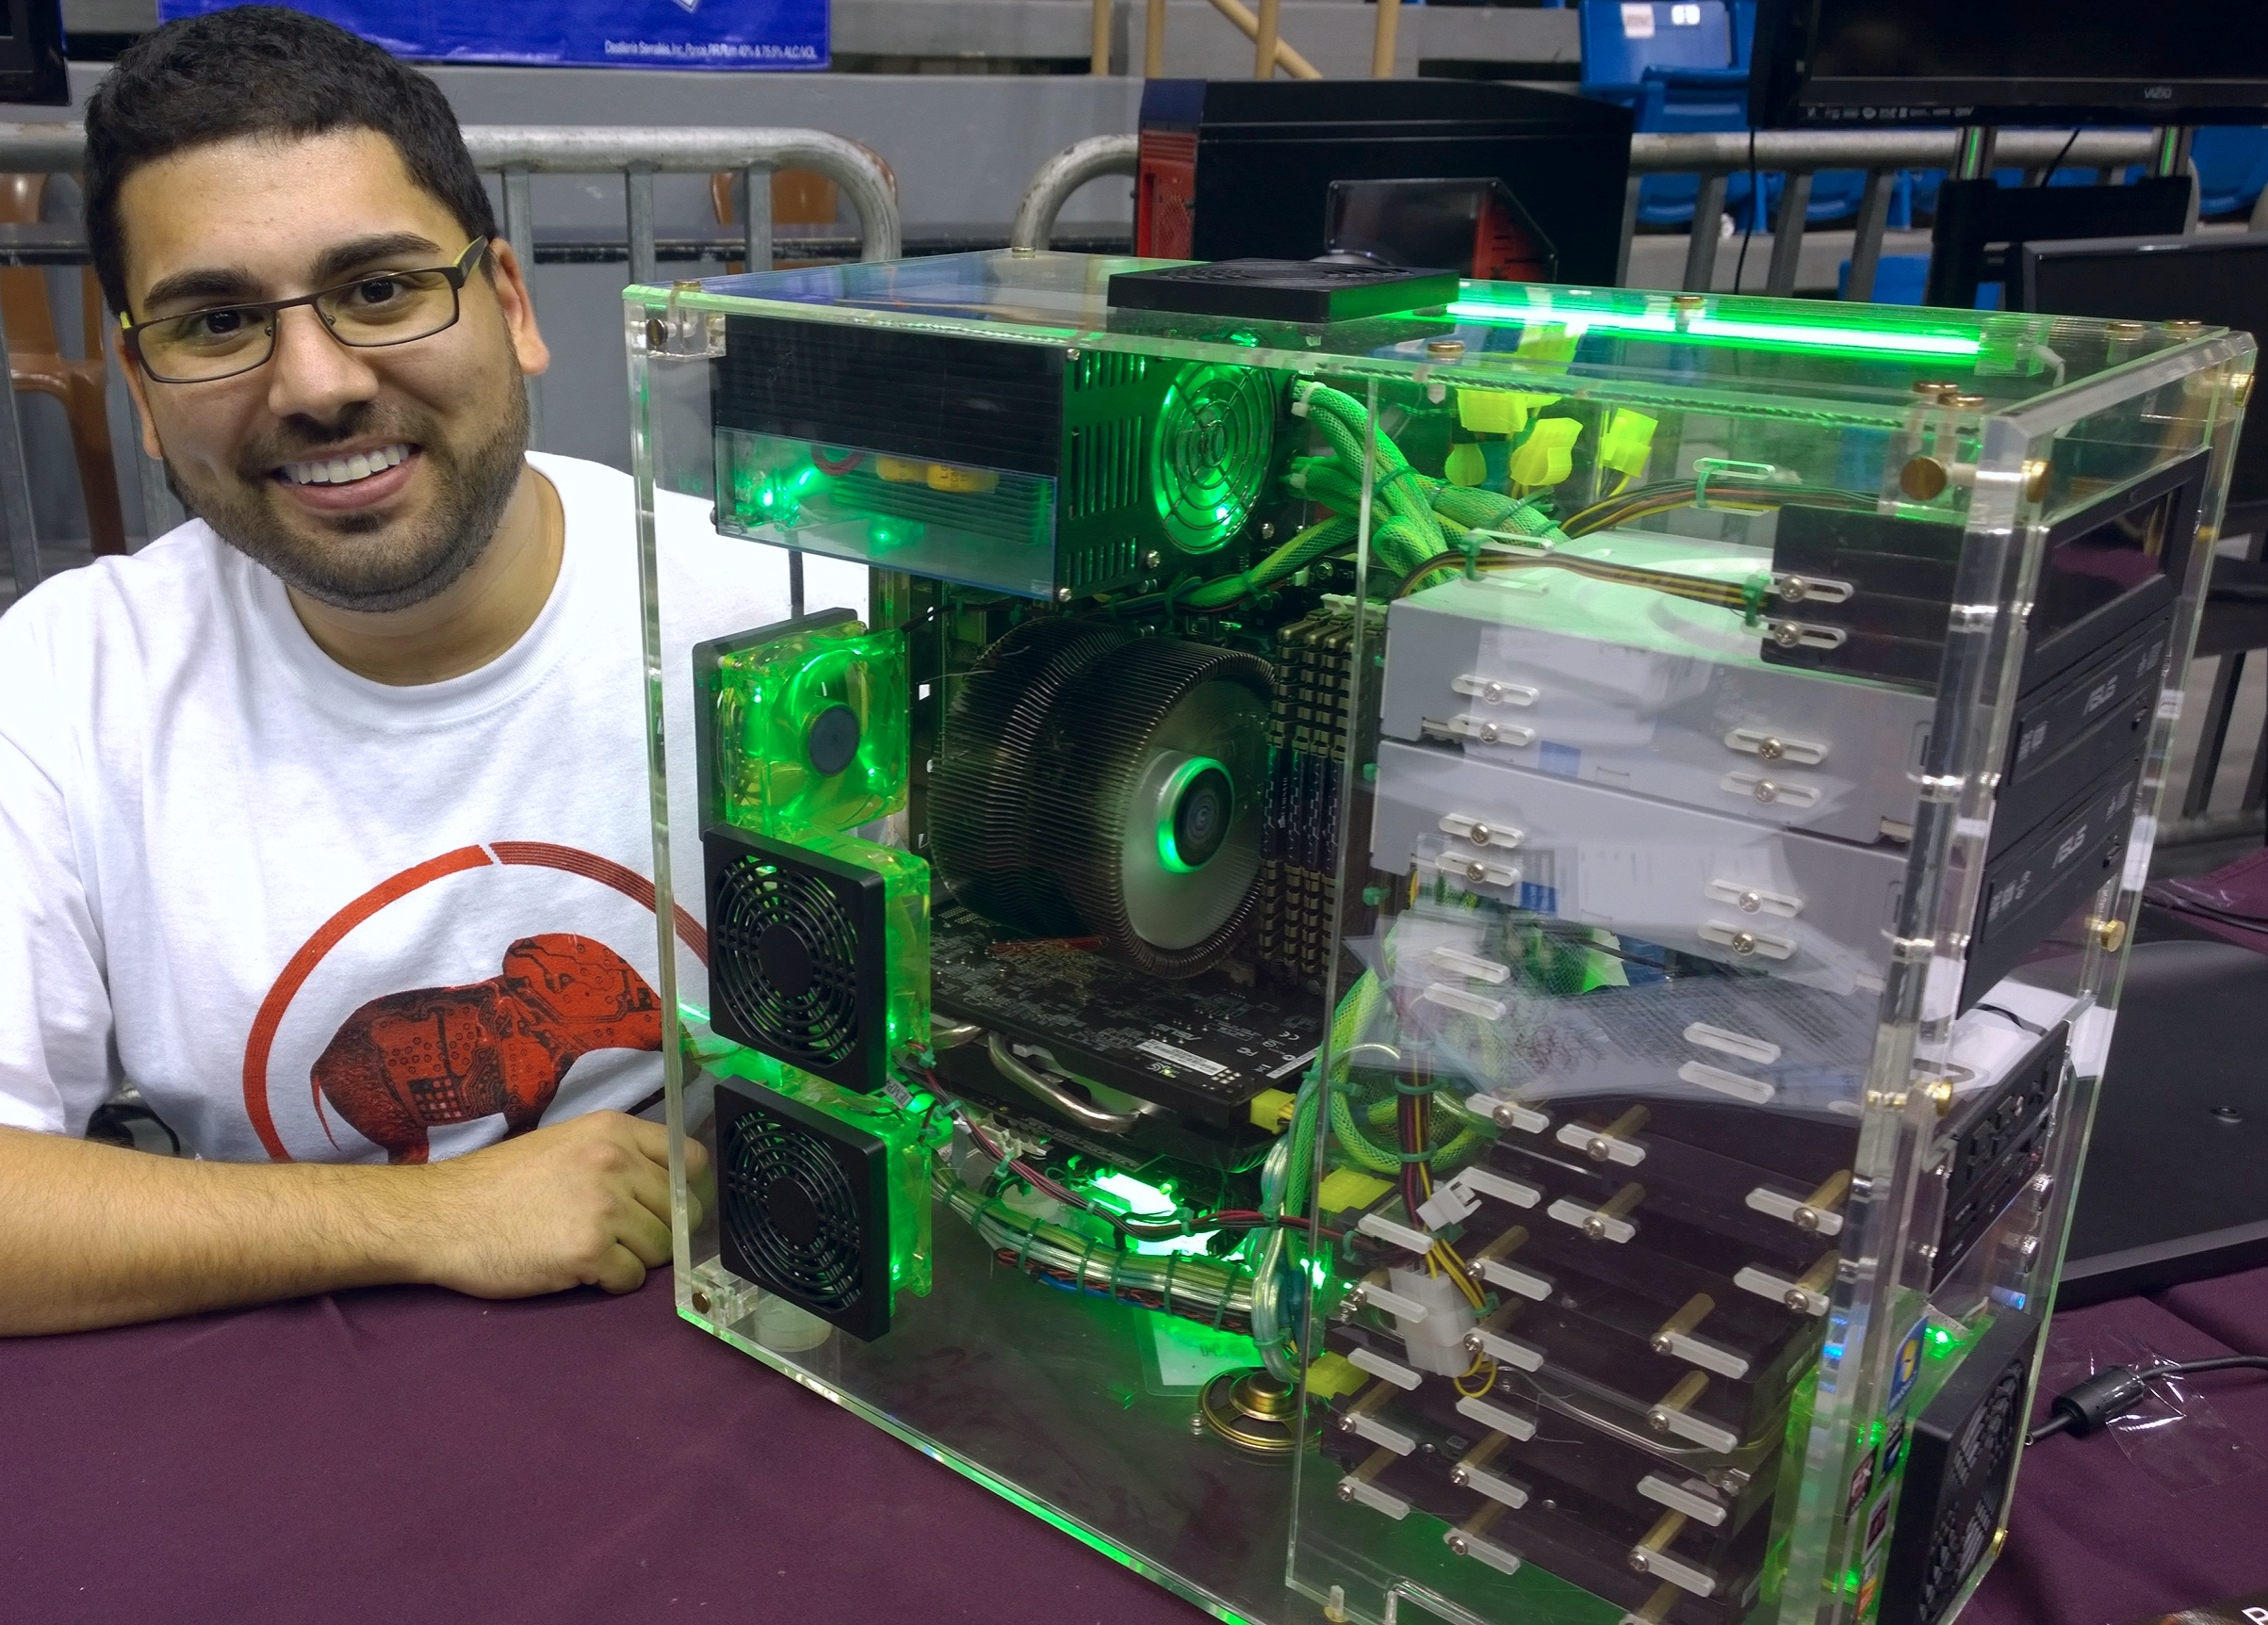 Paul Bangdiwala - Owner of Bandi Tech LLC with the Kryptonite Signature PC